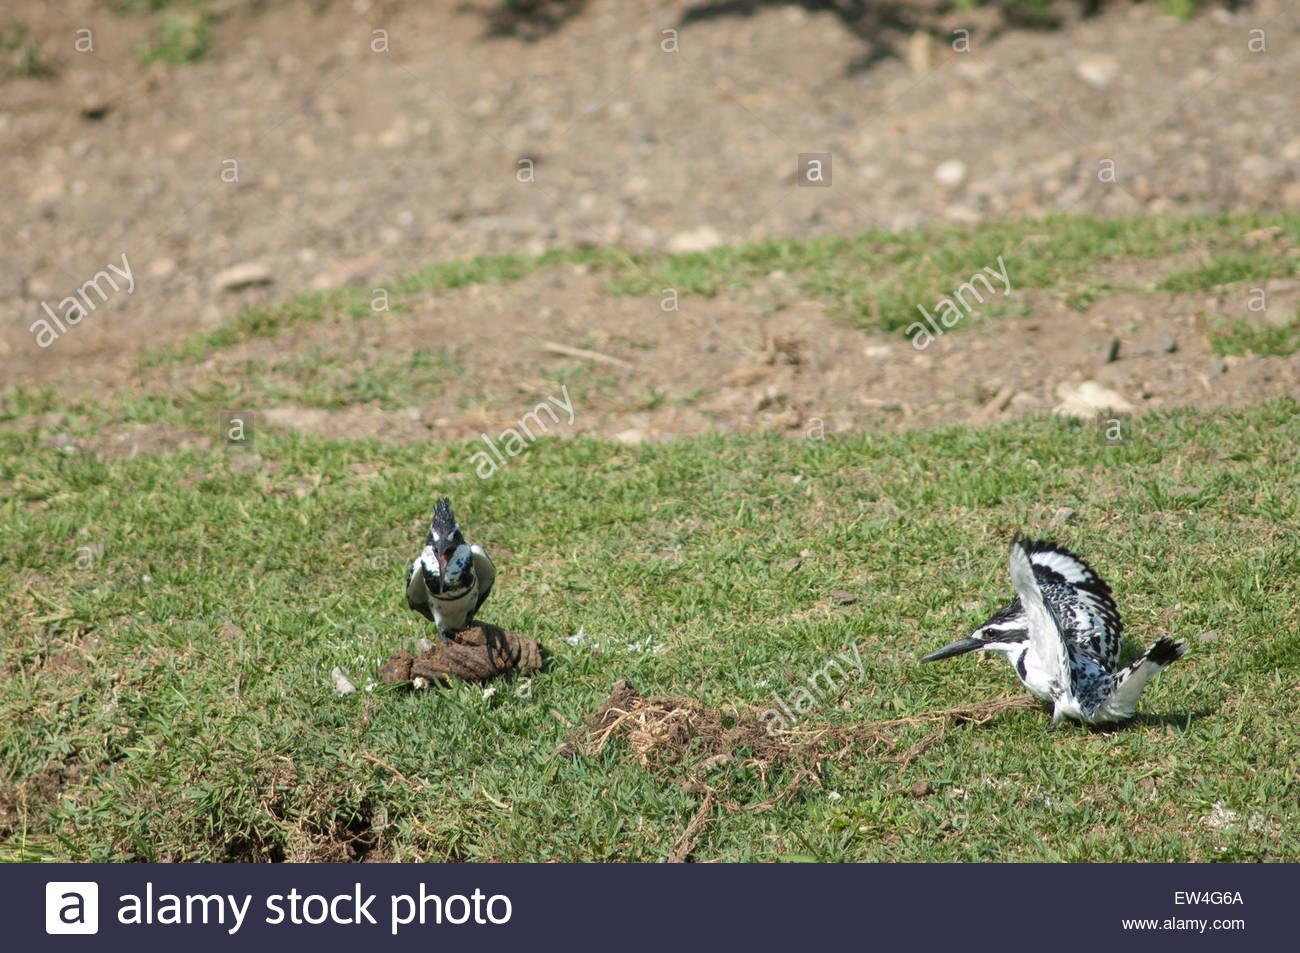 Pied kingfishers (Ceryle rudis). Hiran river. Gir Lion Sanctuary and National Park. Gujarat. India. - Stock Image